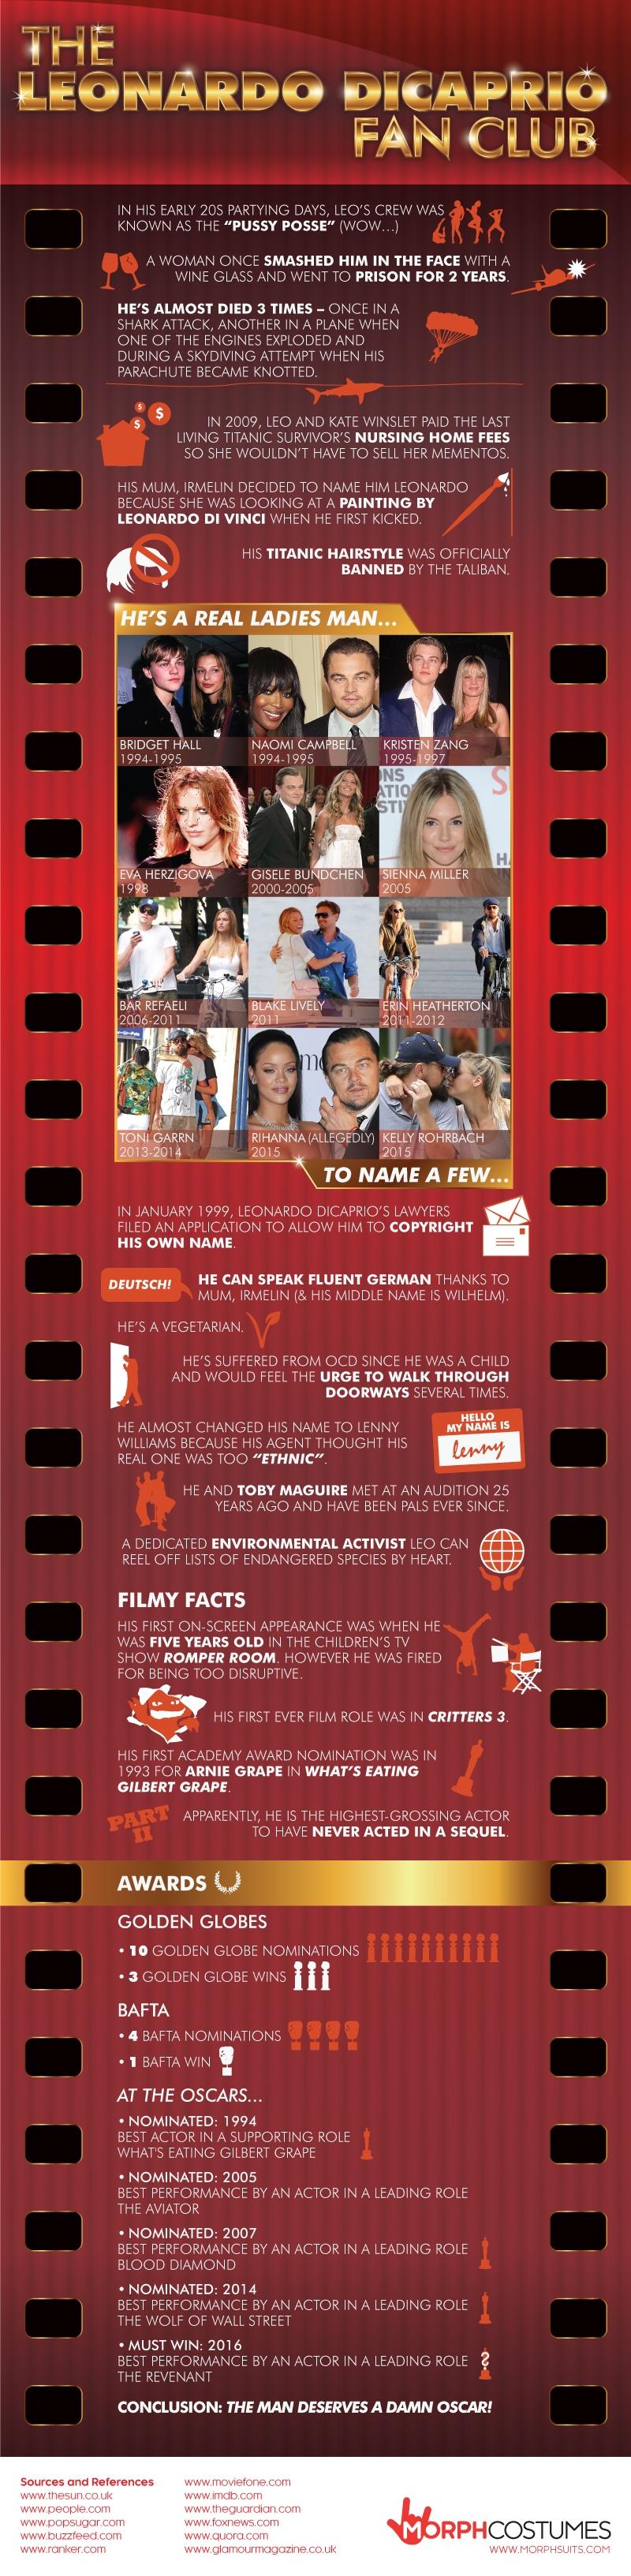 The Leonardo DiCaprio Fan Club Infographic